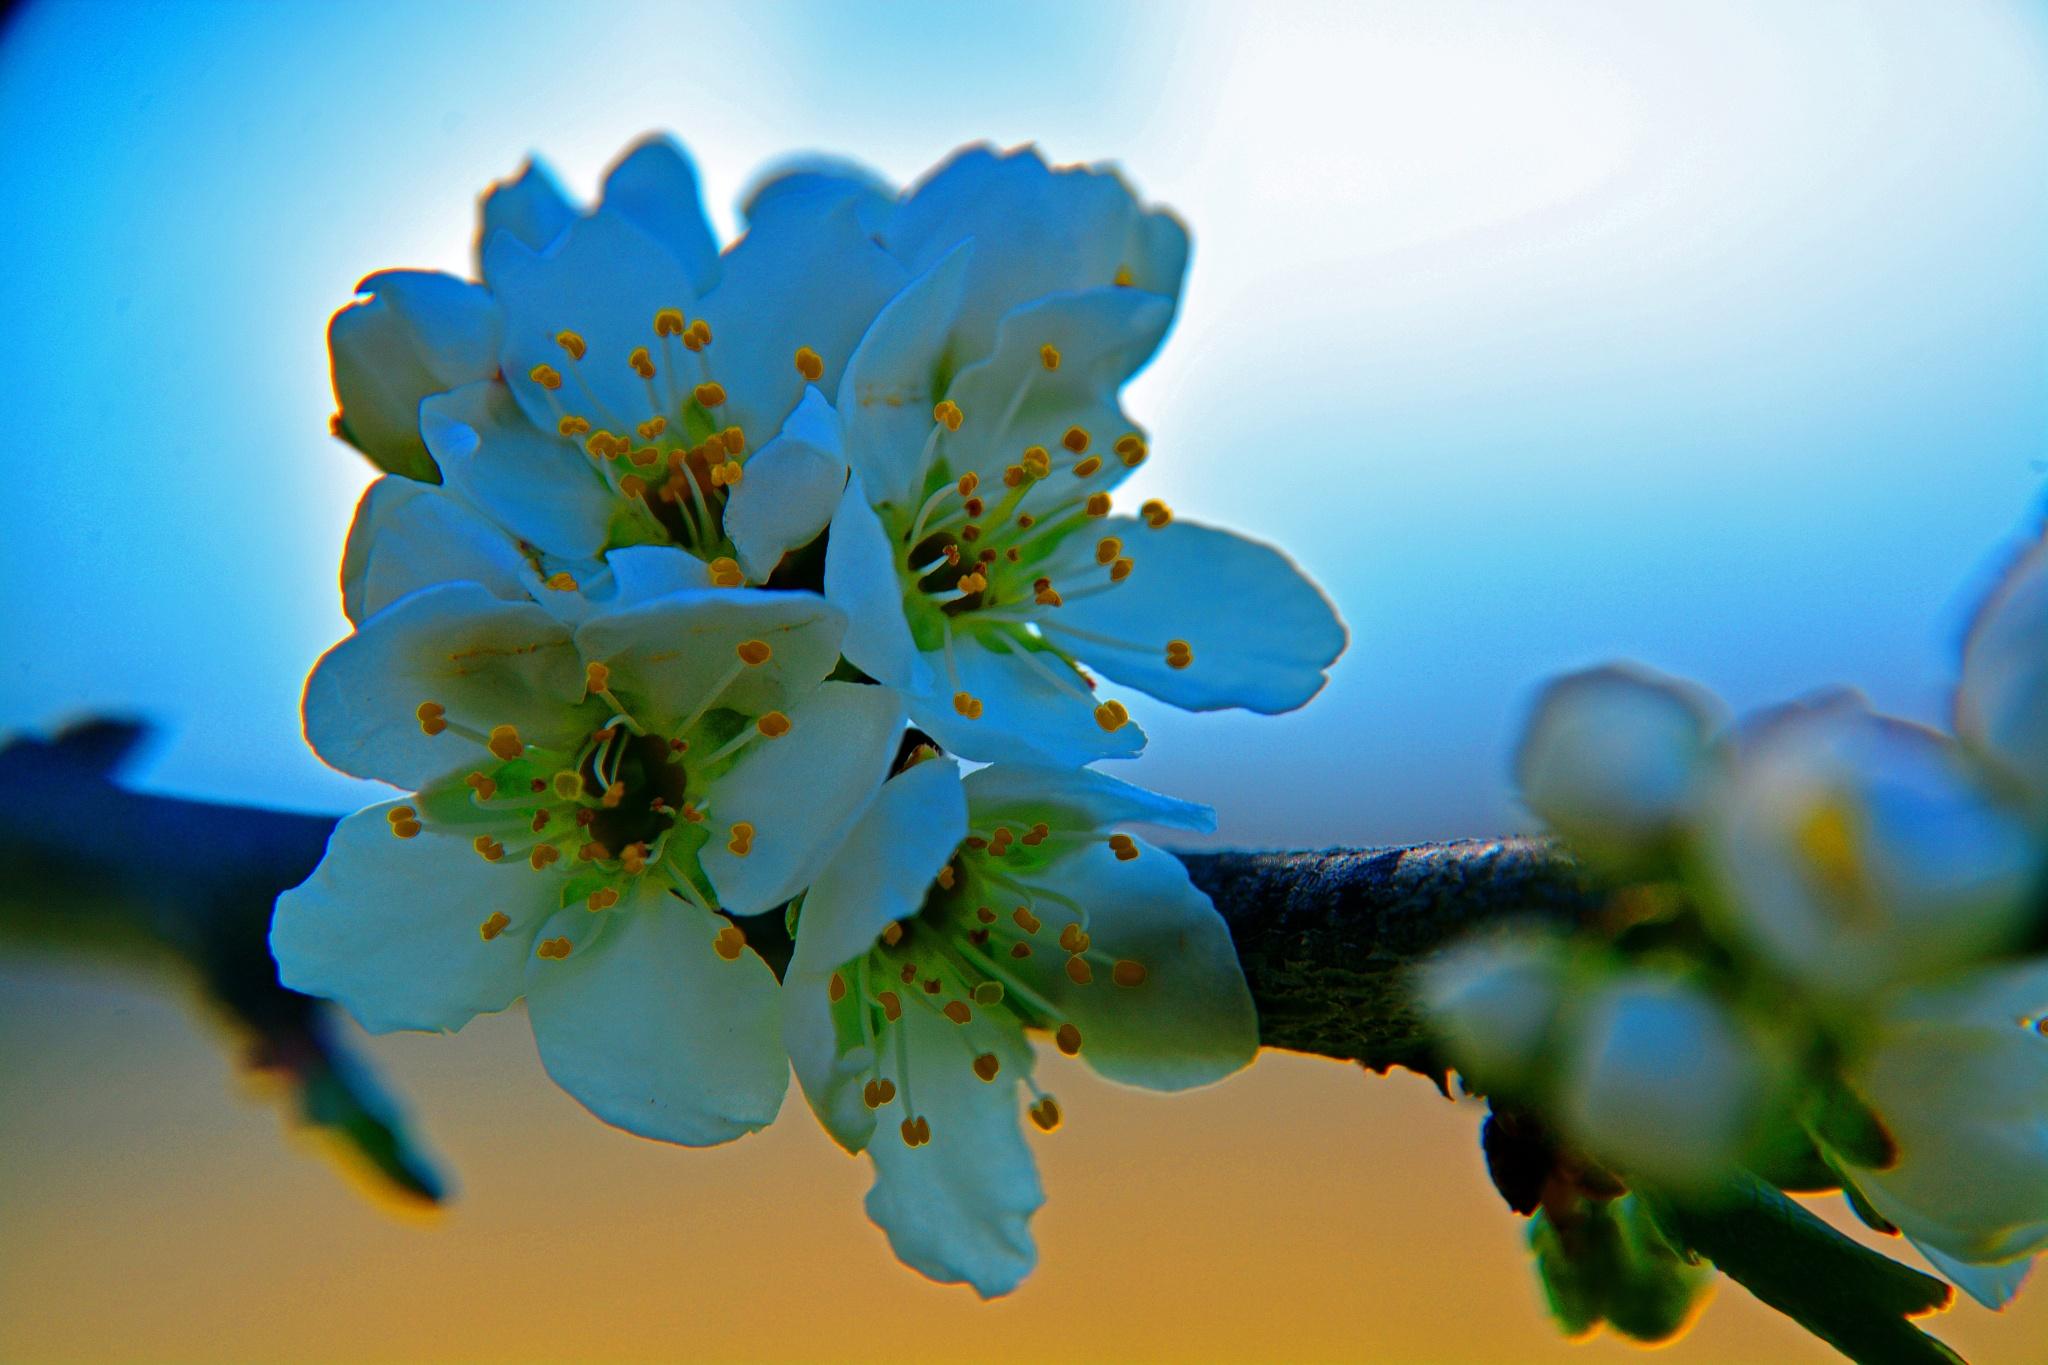 Plumb tree blossom by William C. Burton